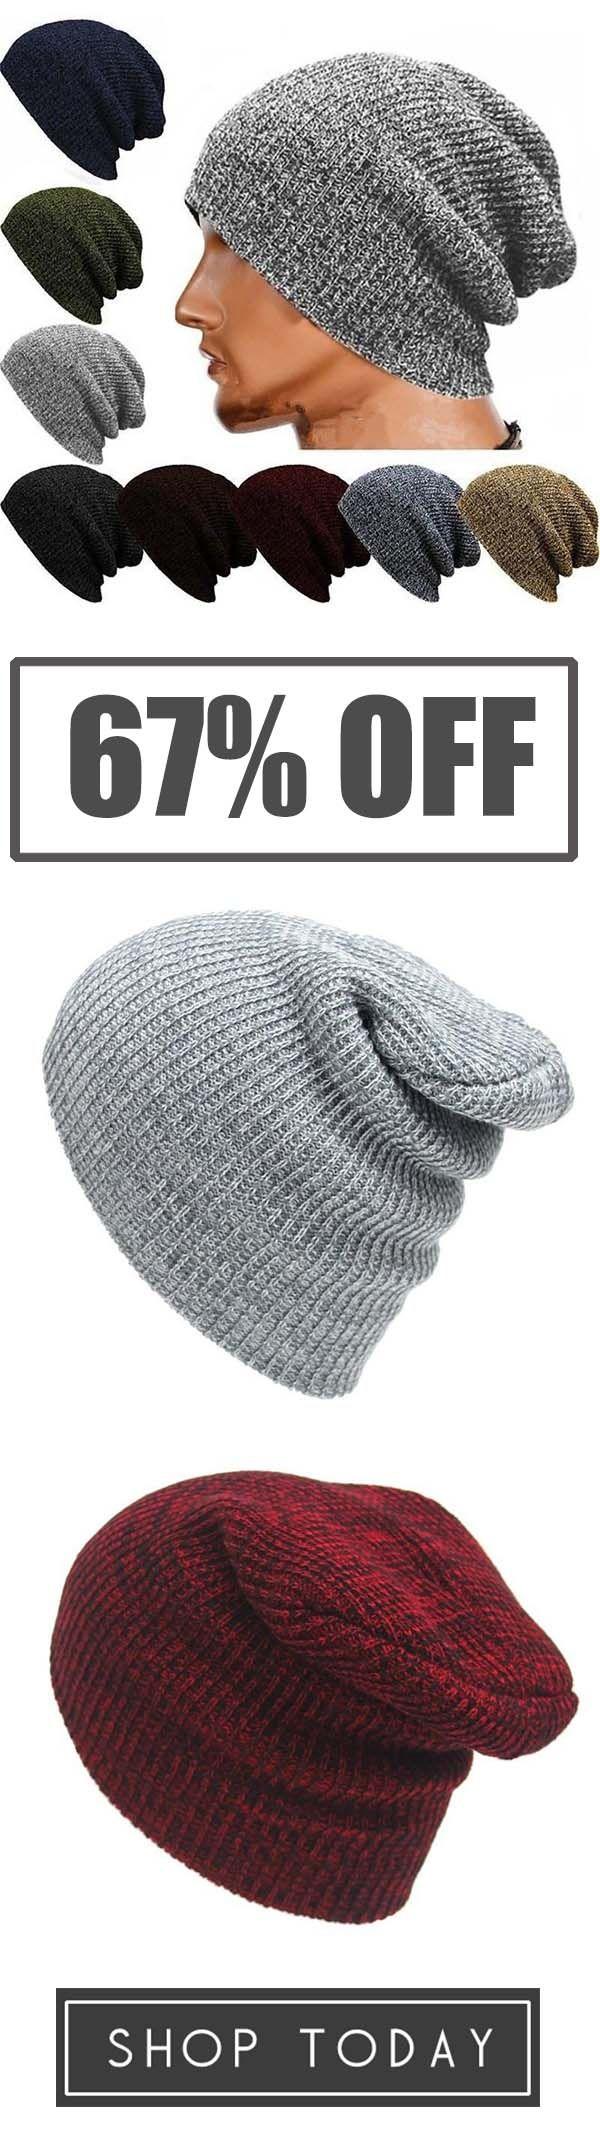 dbda20b890e53a Winter Casual Cotton Knit Cap Baggy Beanie Crochet Cap Outdoor Ski Cap